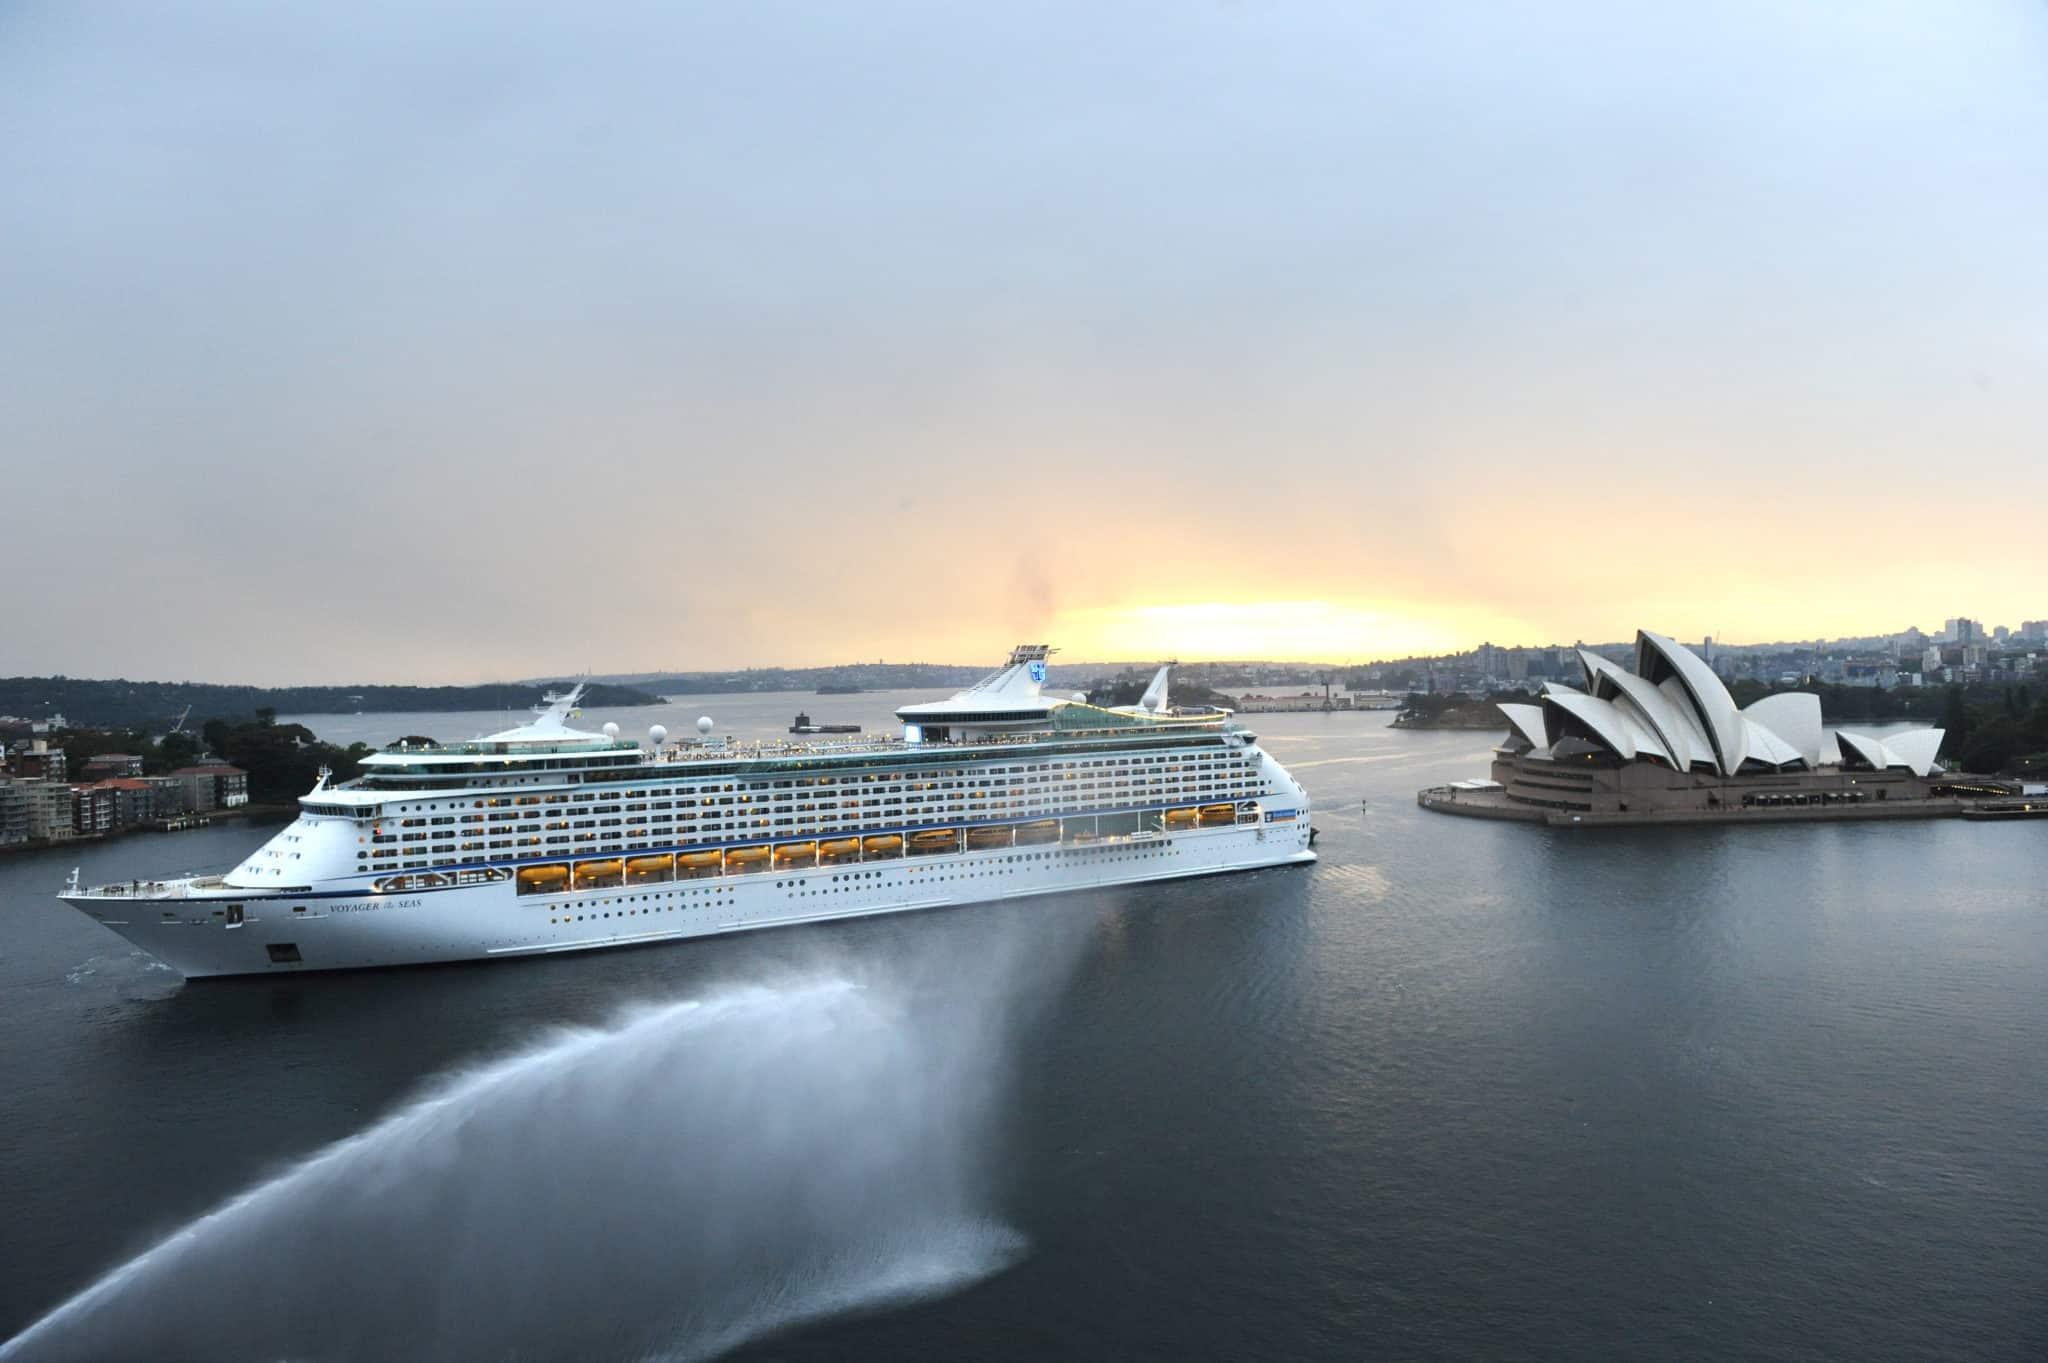 voyager of the seas sydney australia